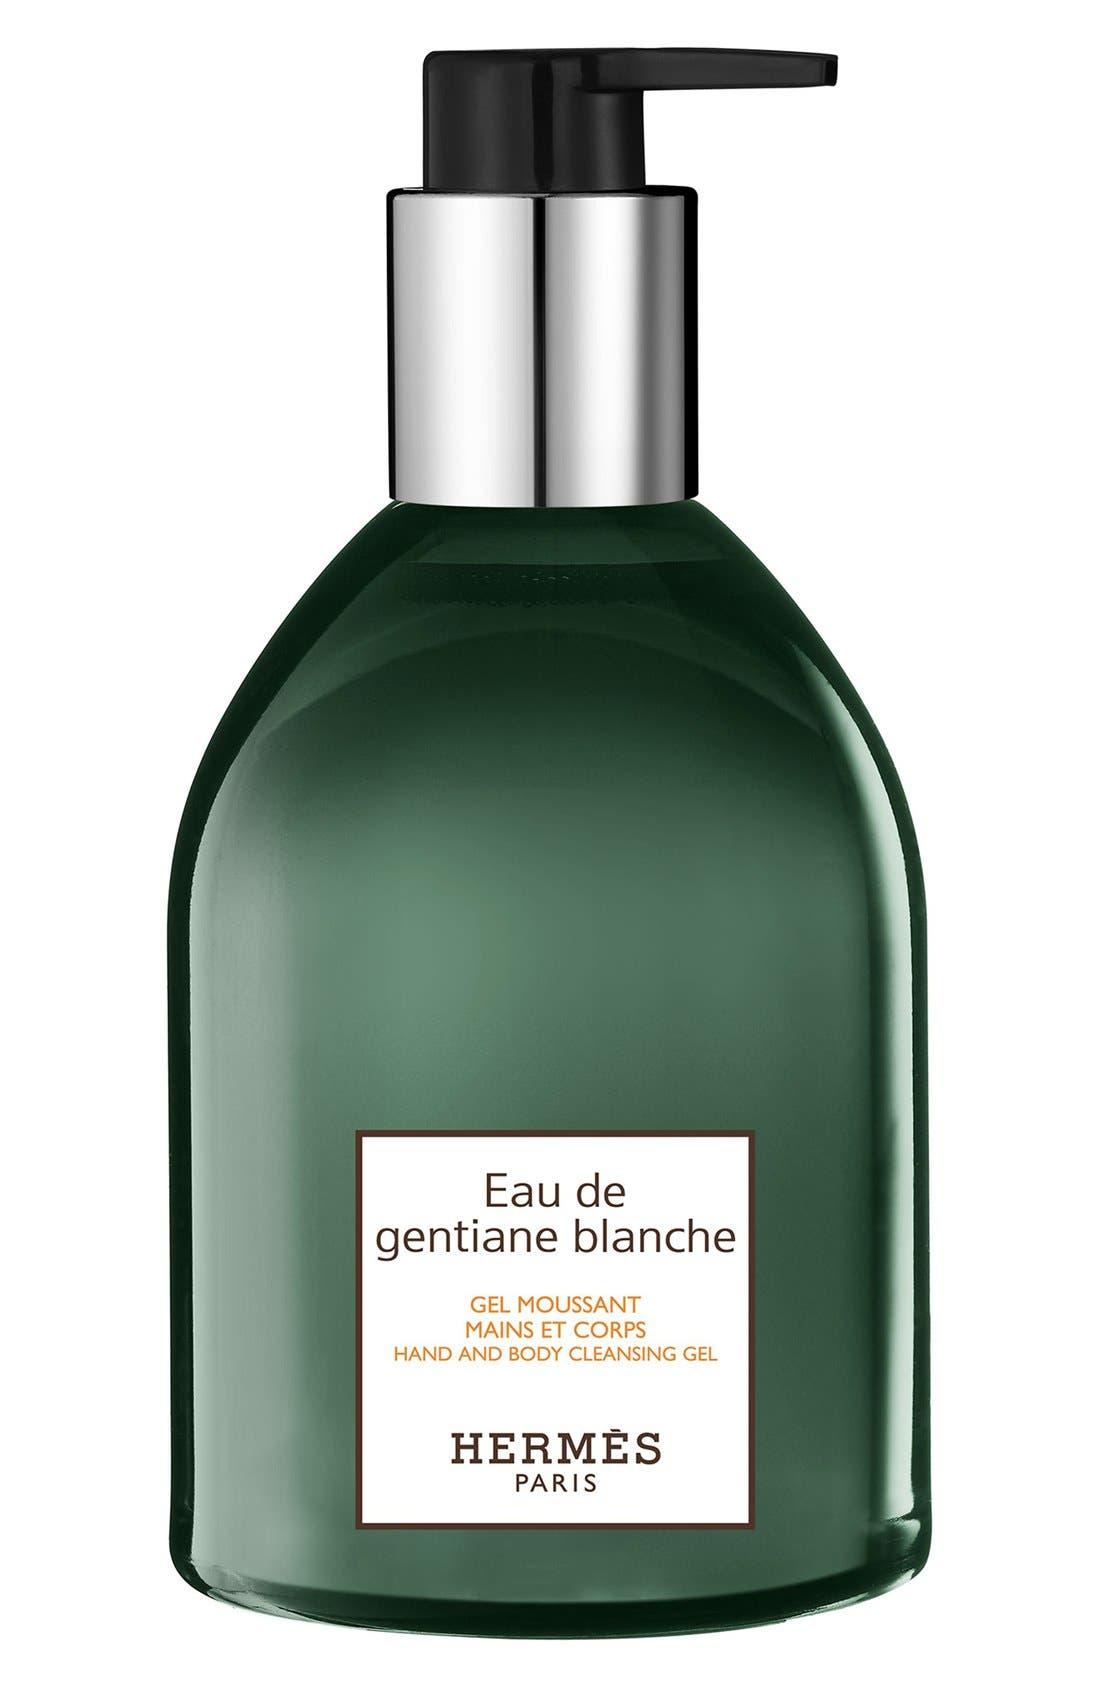 Hermès Eau de Gentiane Blanche - Hand and body cleansing gel